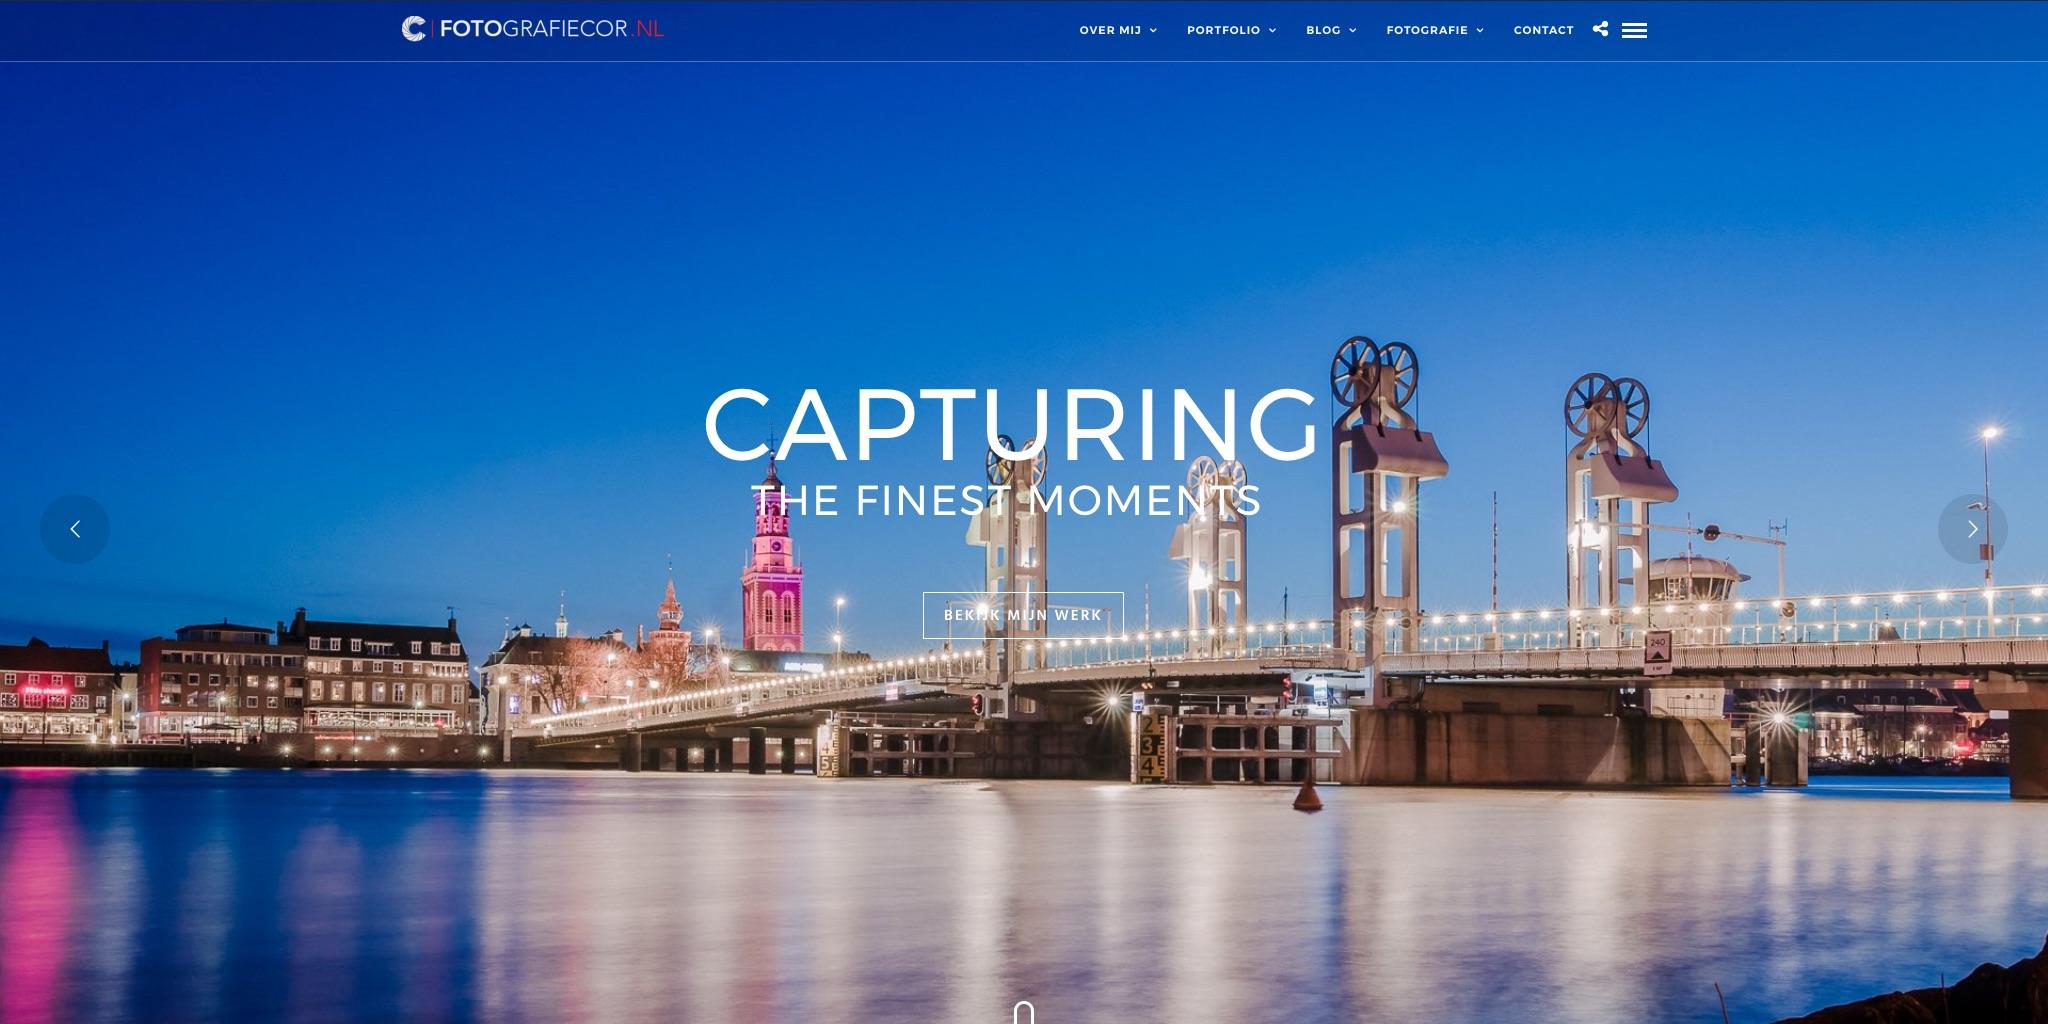 Foto website van fotograaf uit Kampen met foto van Kamper Stadsbrug